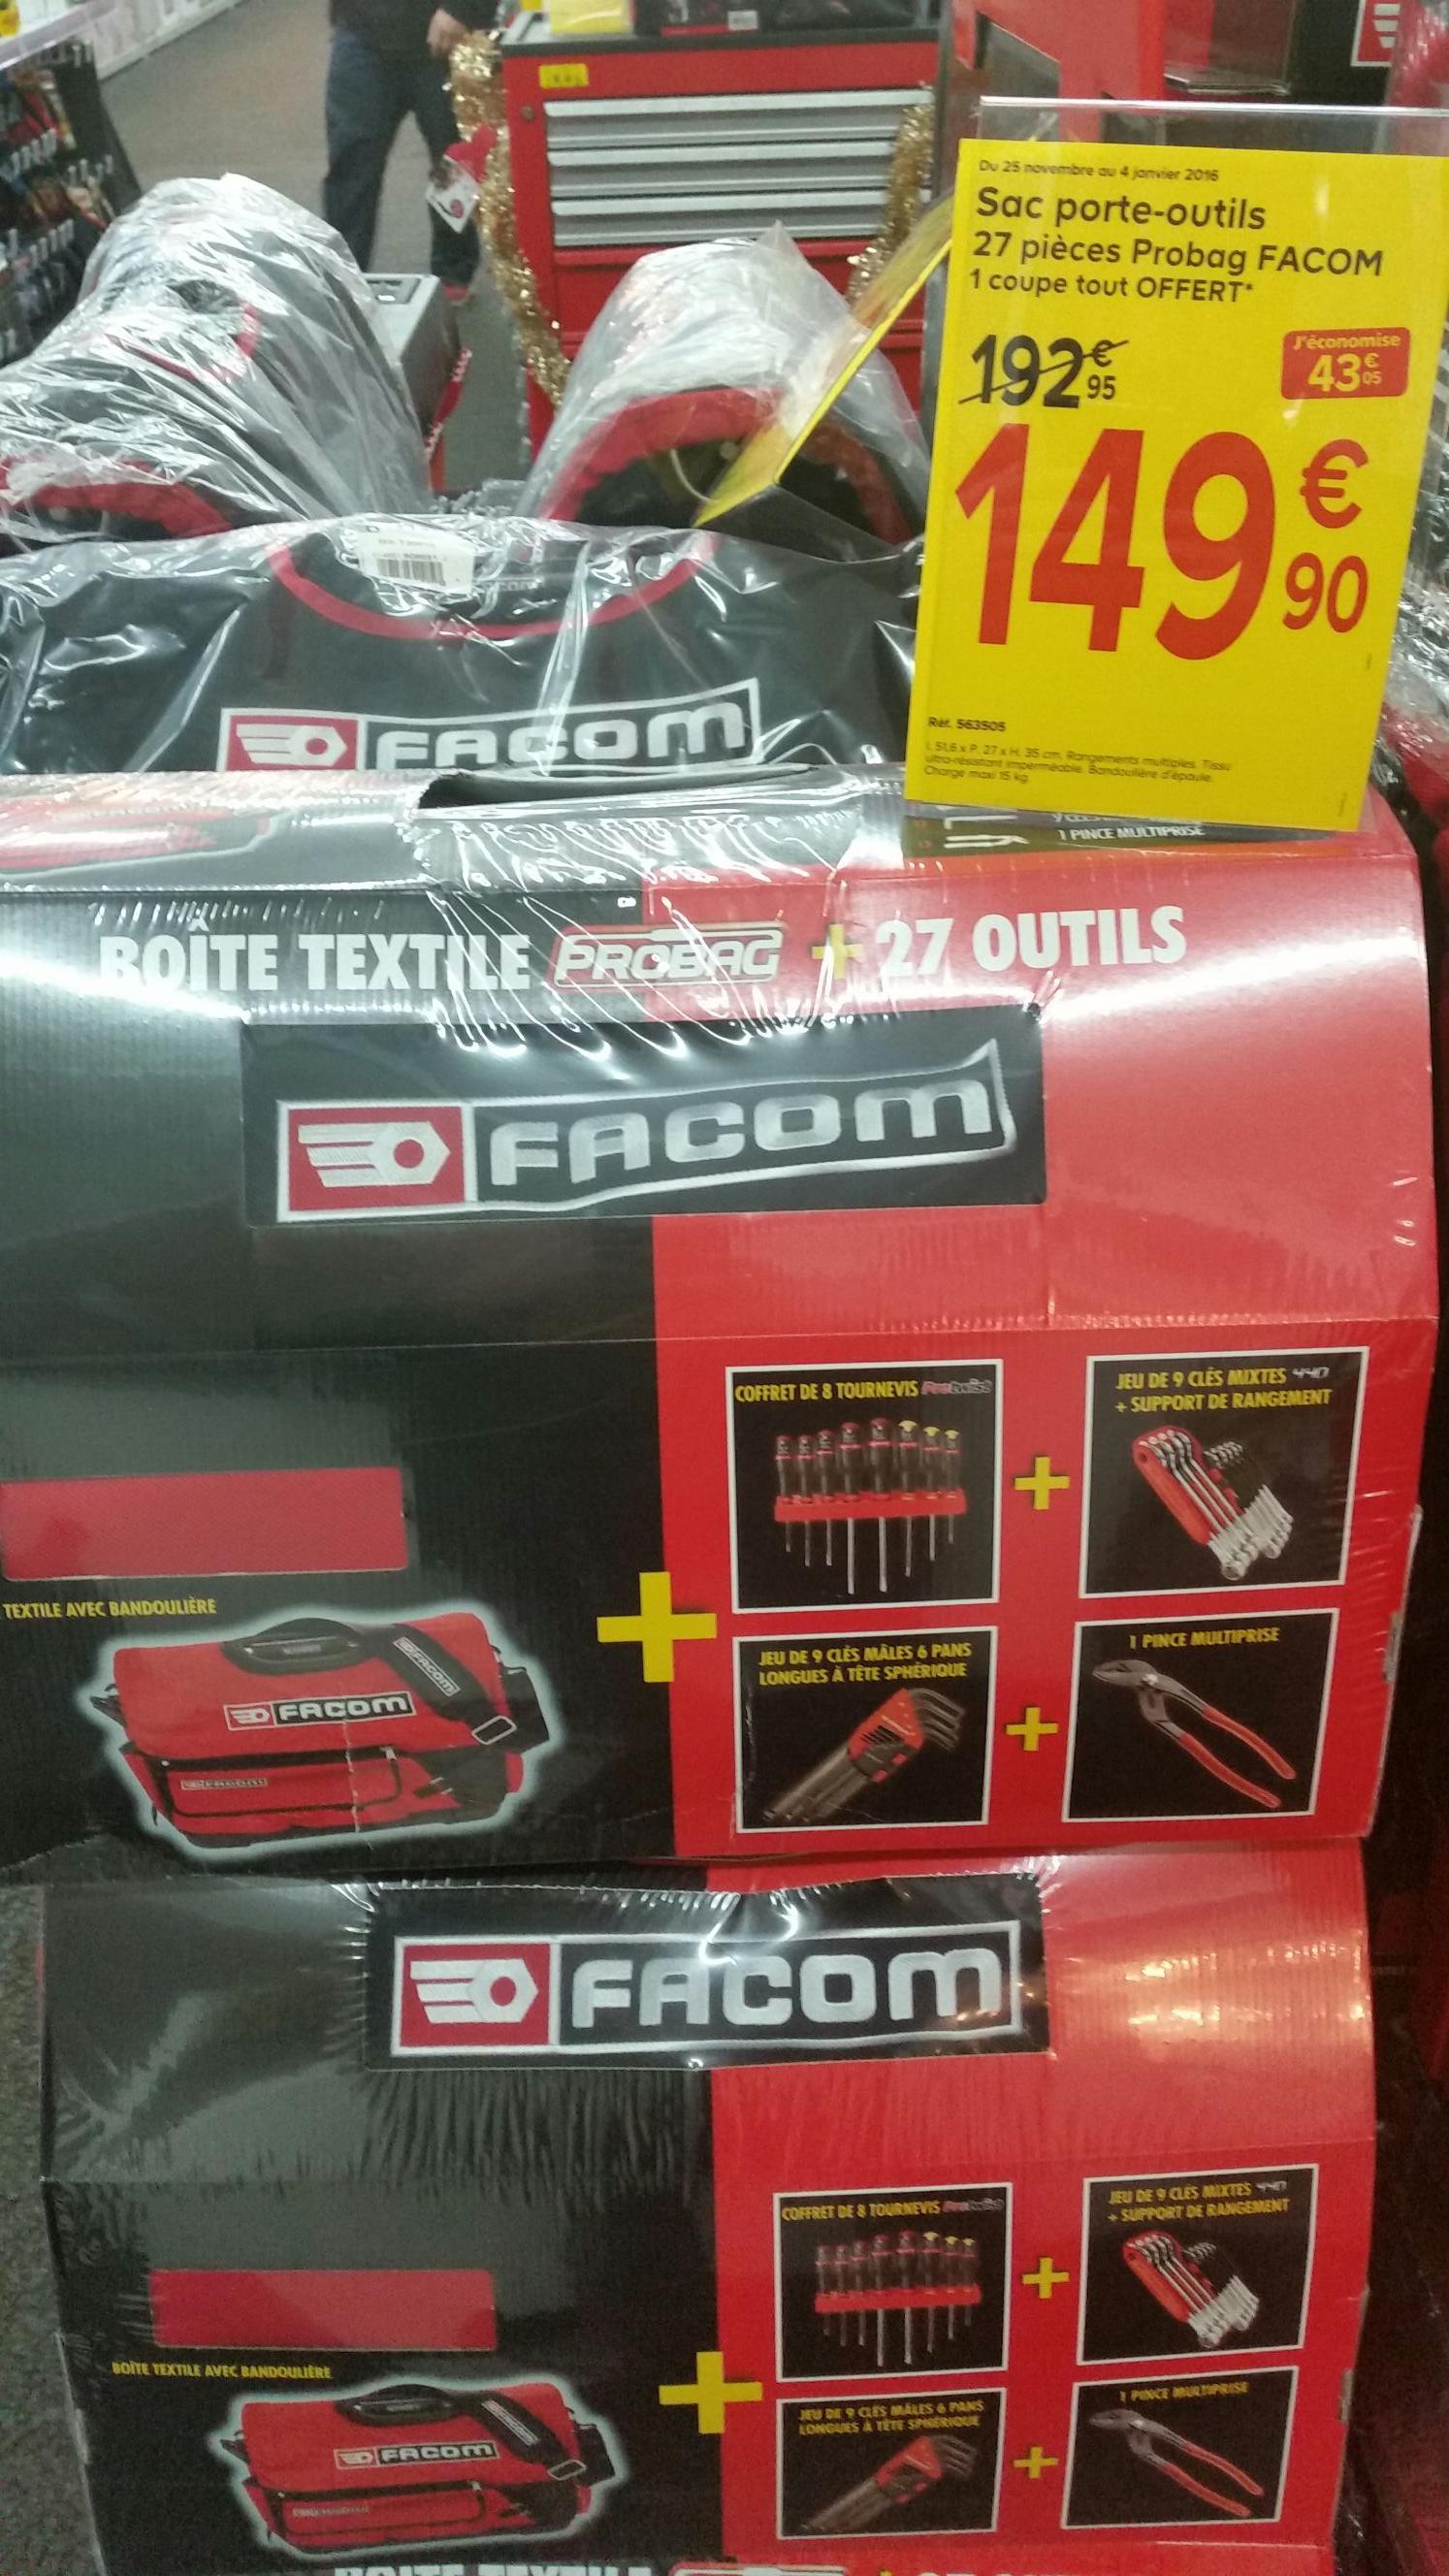 Sac porte-outils Facom Probag 27 pièces + coupe tout offert